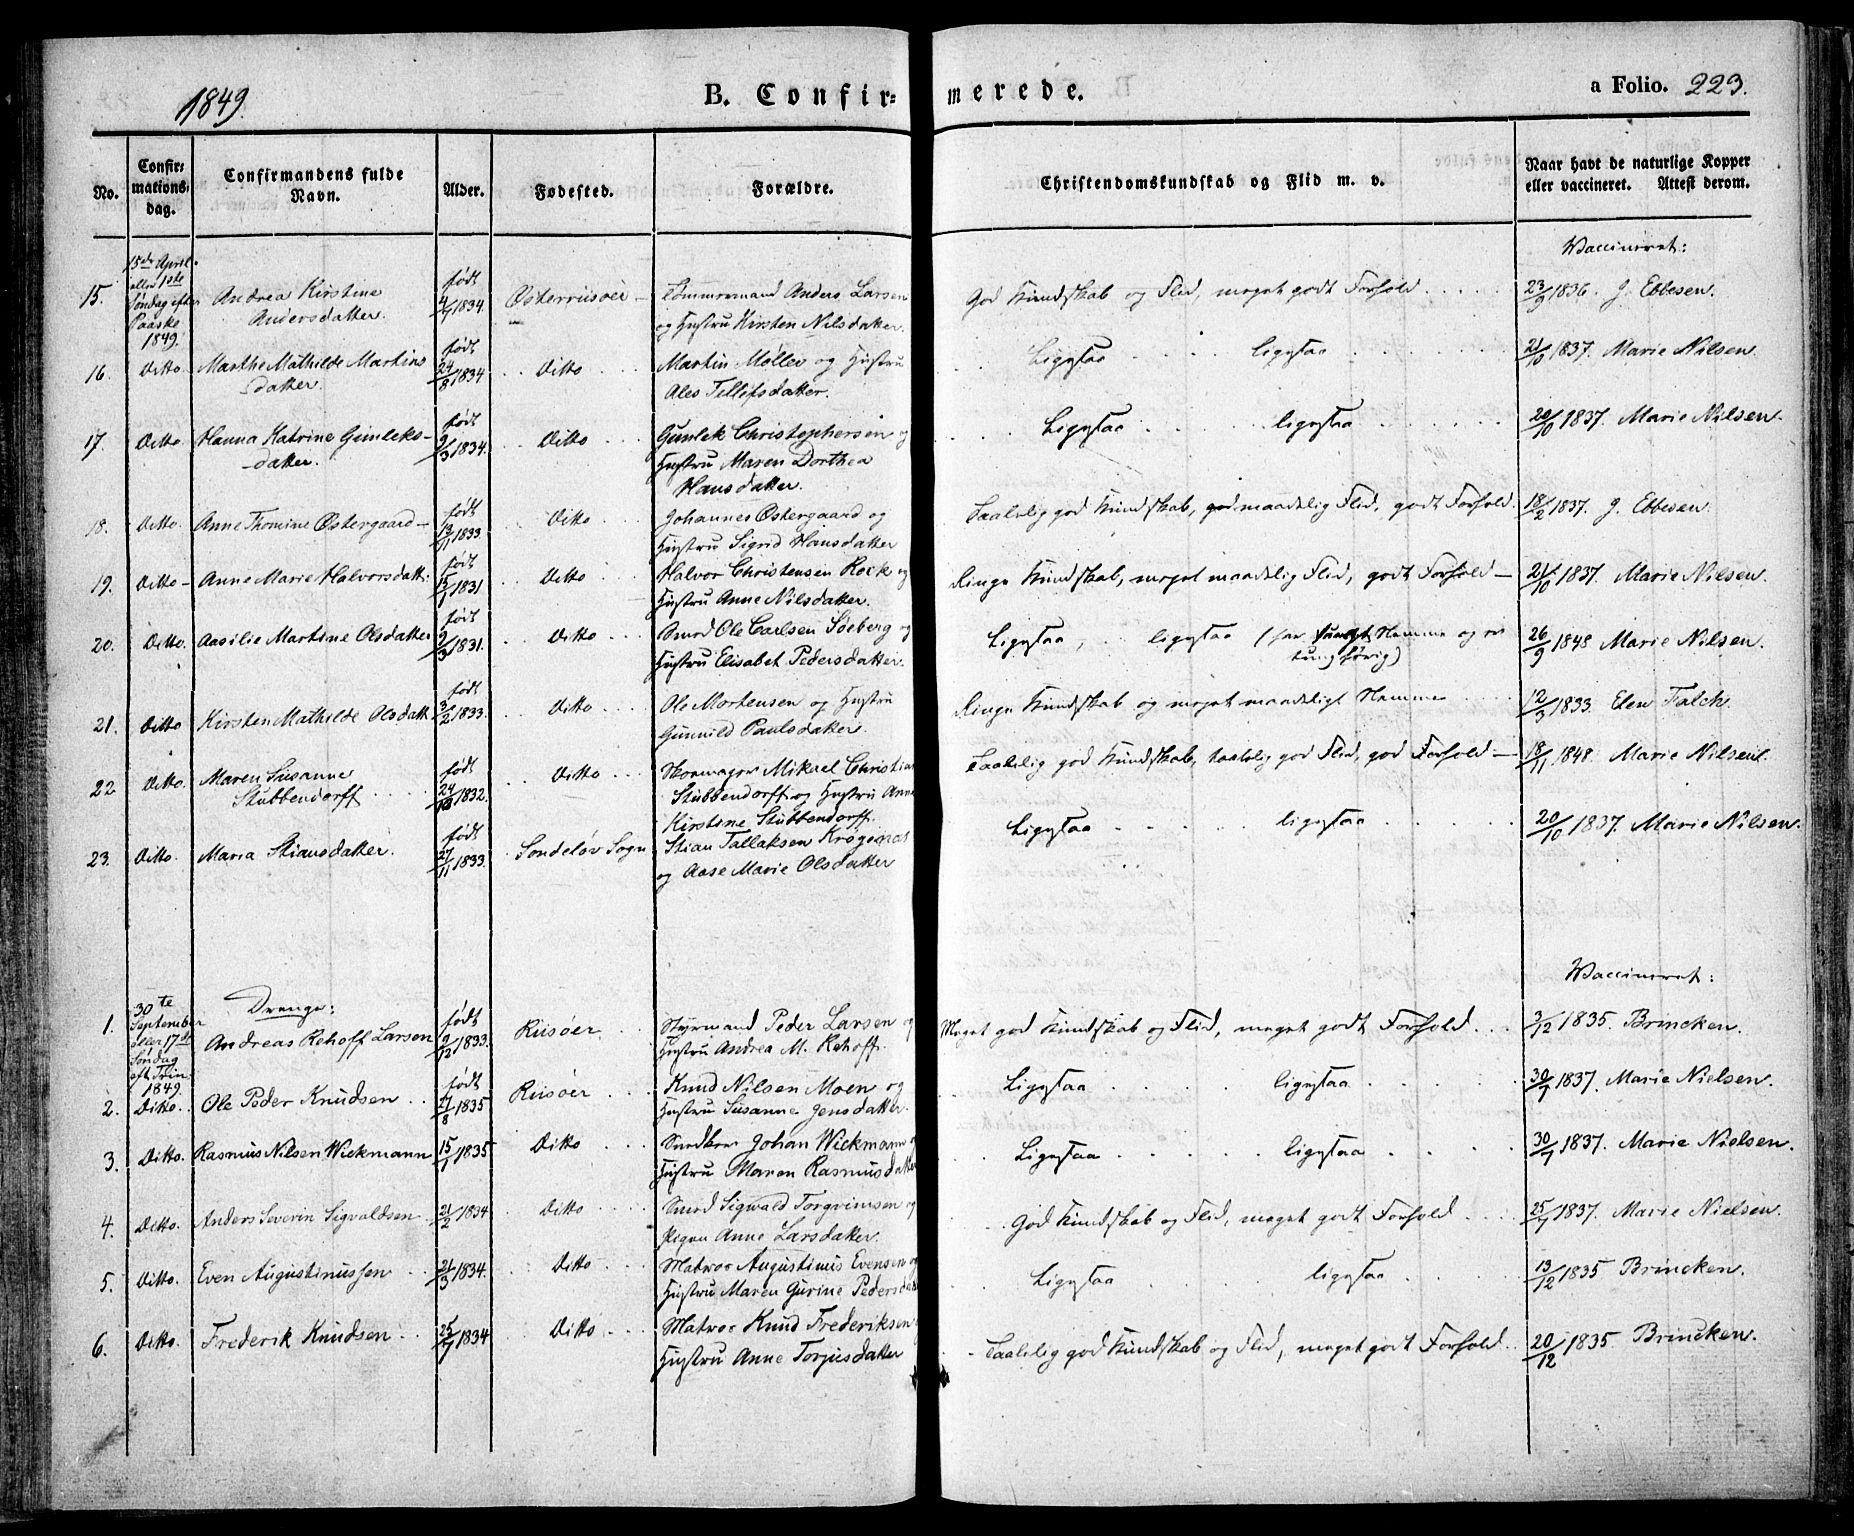 SAK, Risør sokneprestkontor, F/Fa/L0003: Ministerialbok nr. A 3, 1838-1864, s. 223